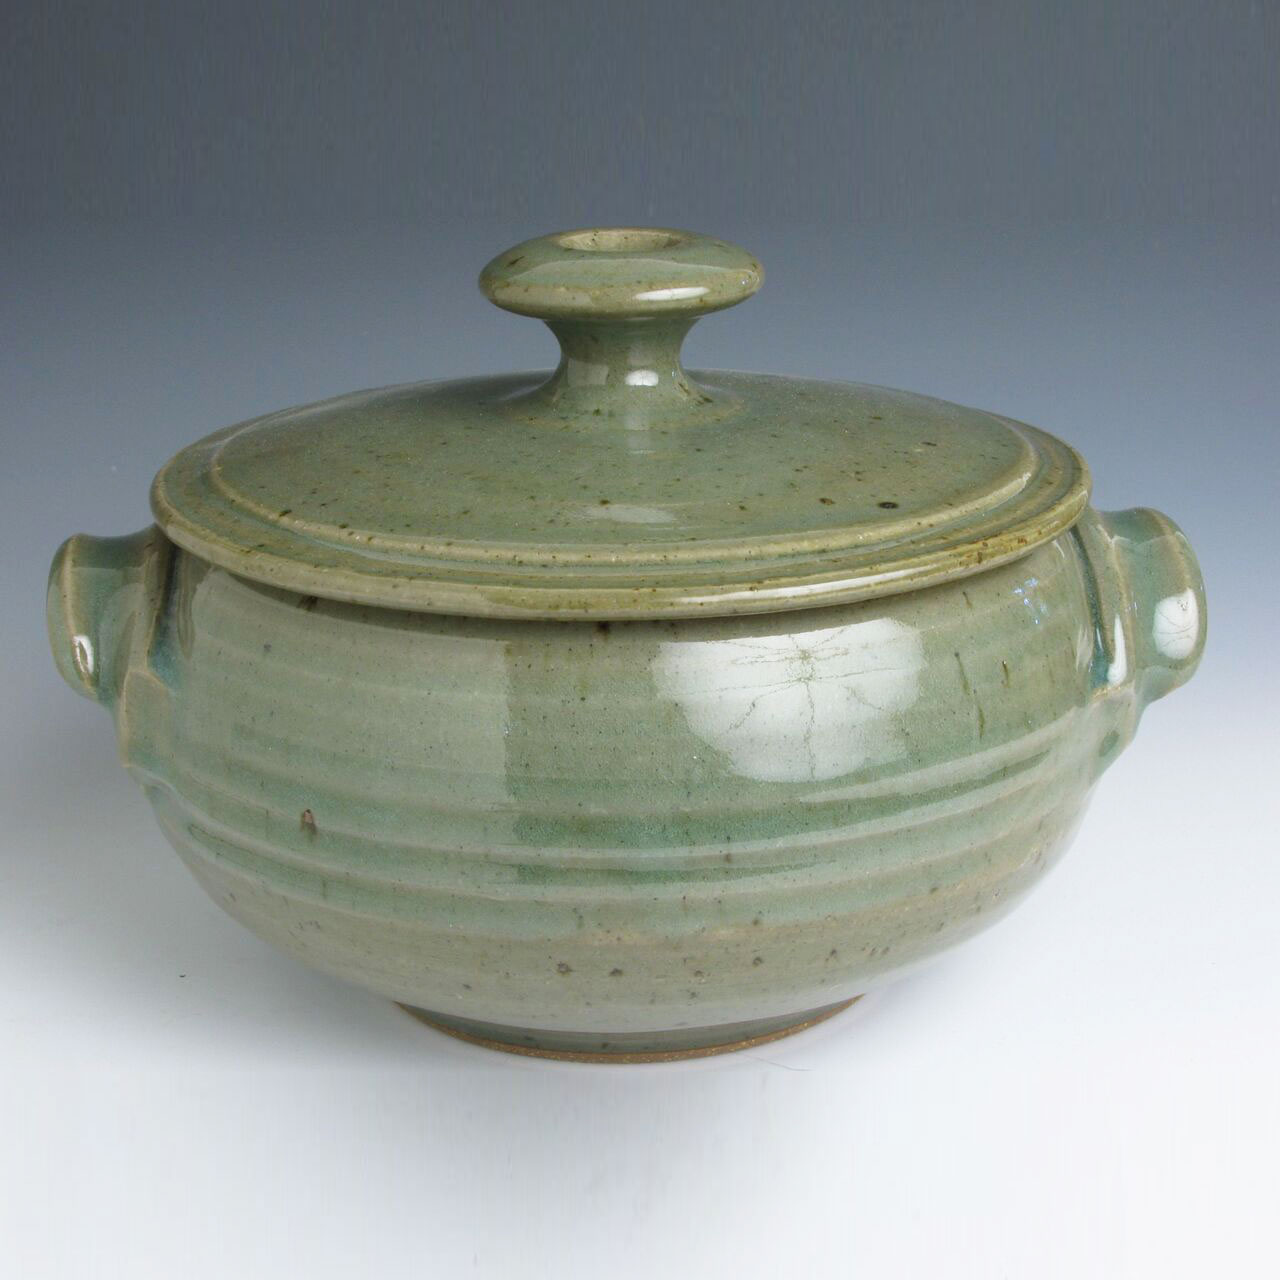 Functional Stoneware